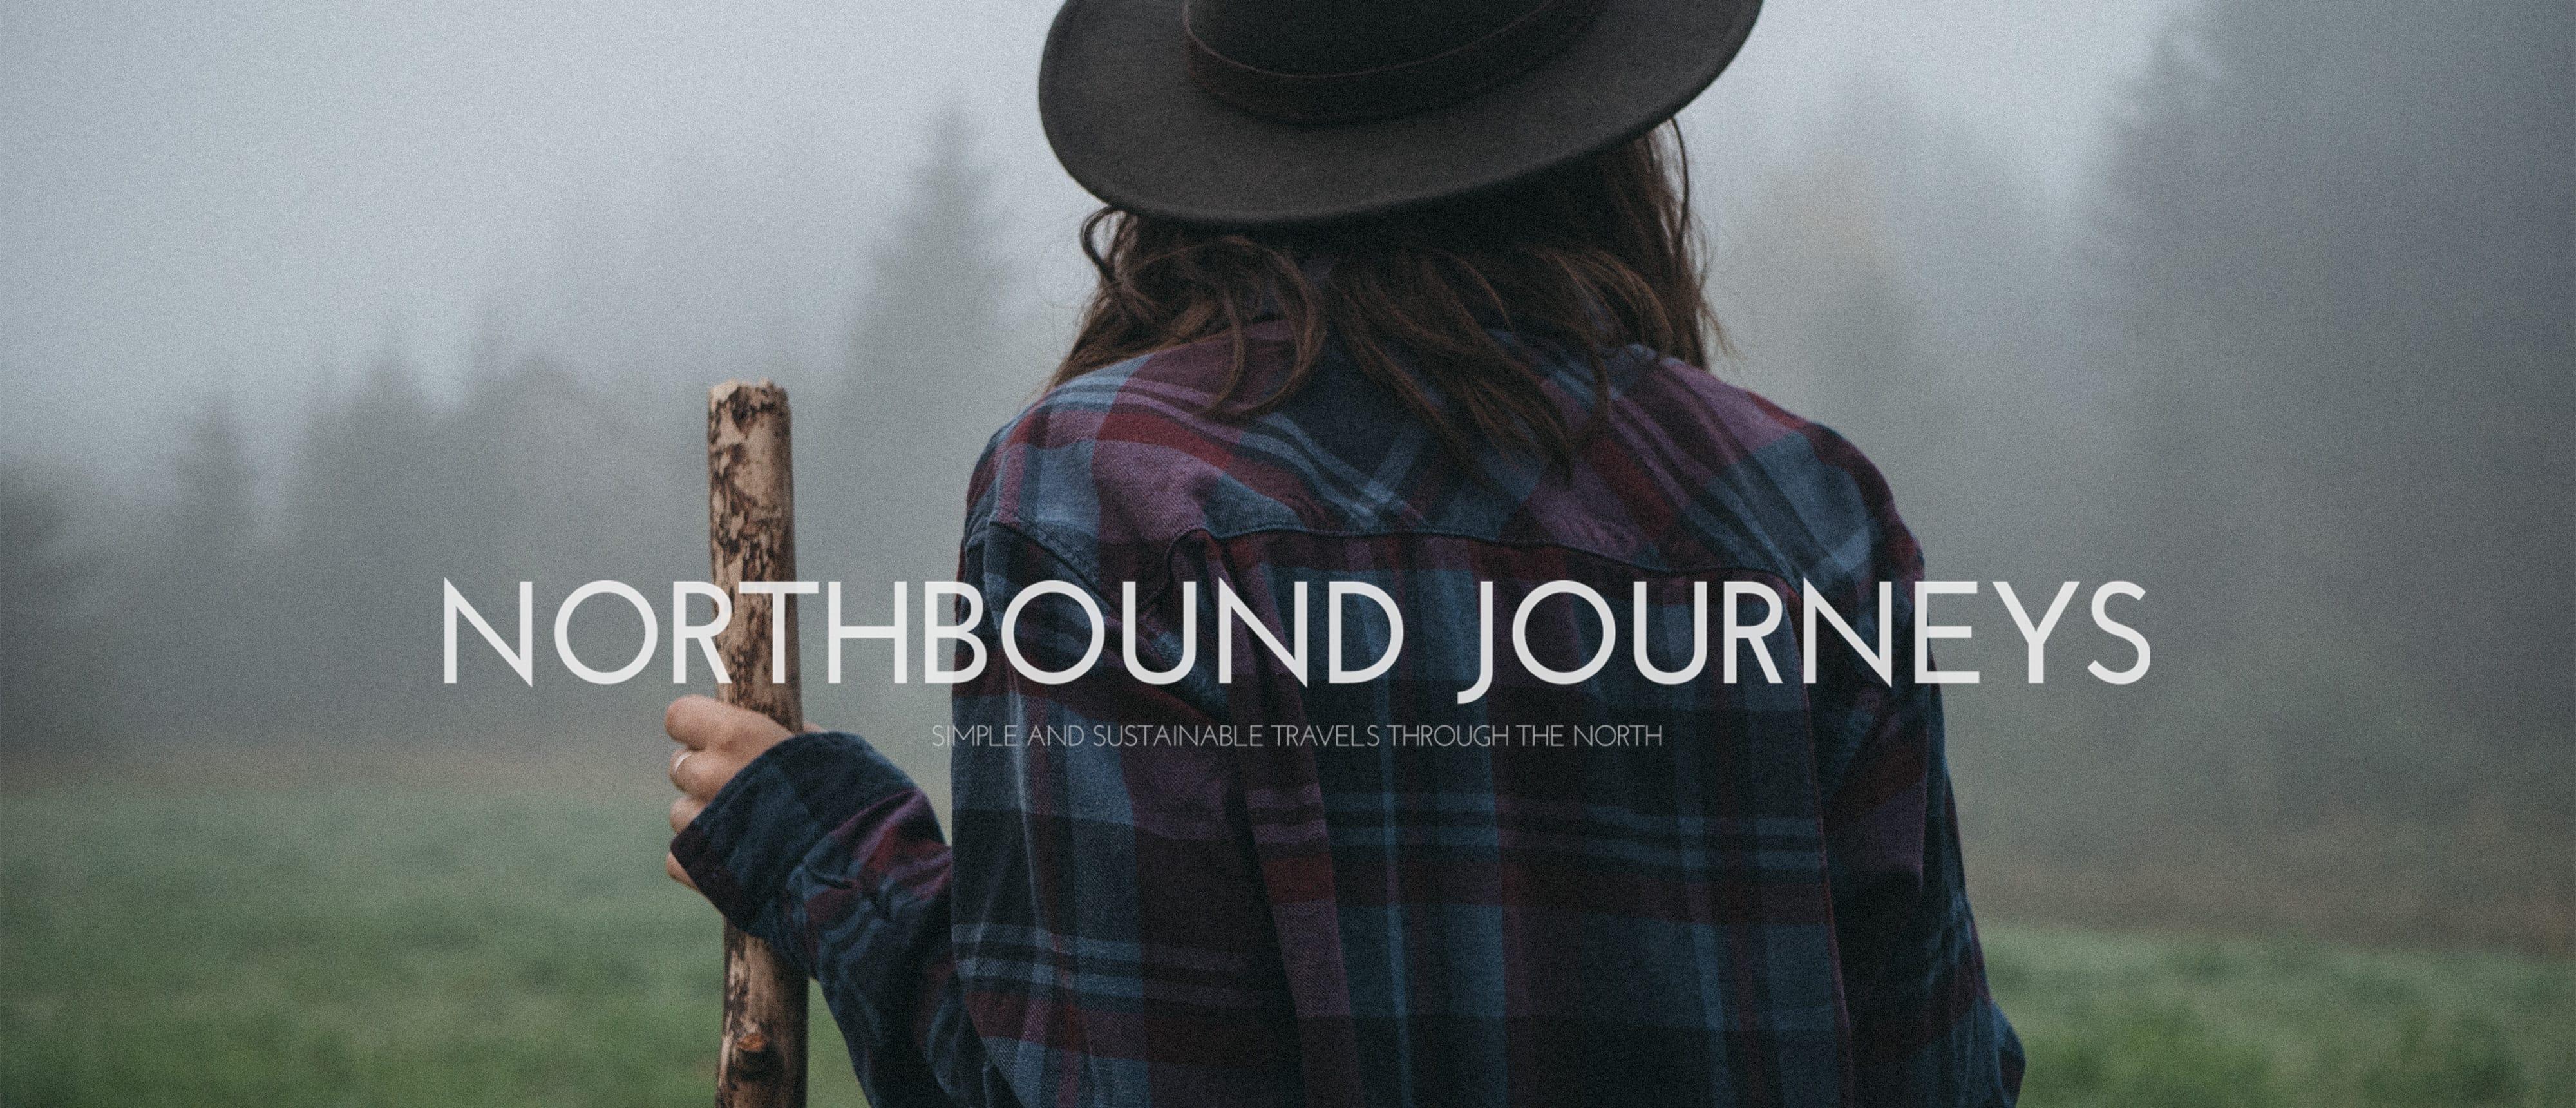 © Rania Rönntoft | Northbound Journeys | www.northboundjourneys.com